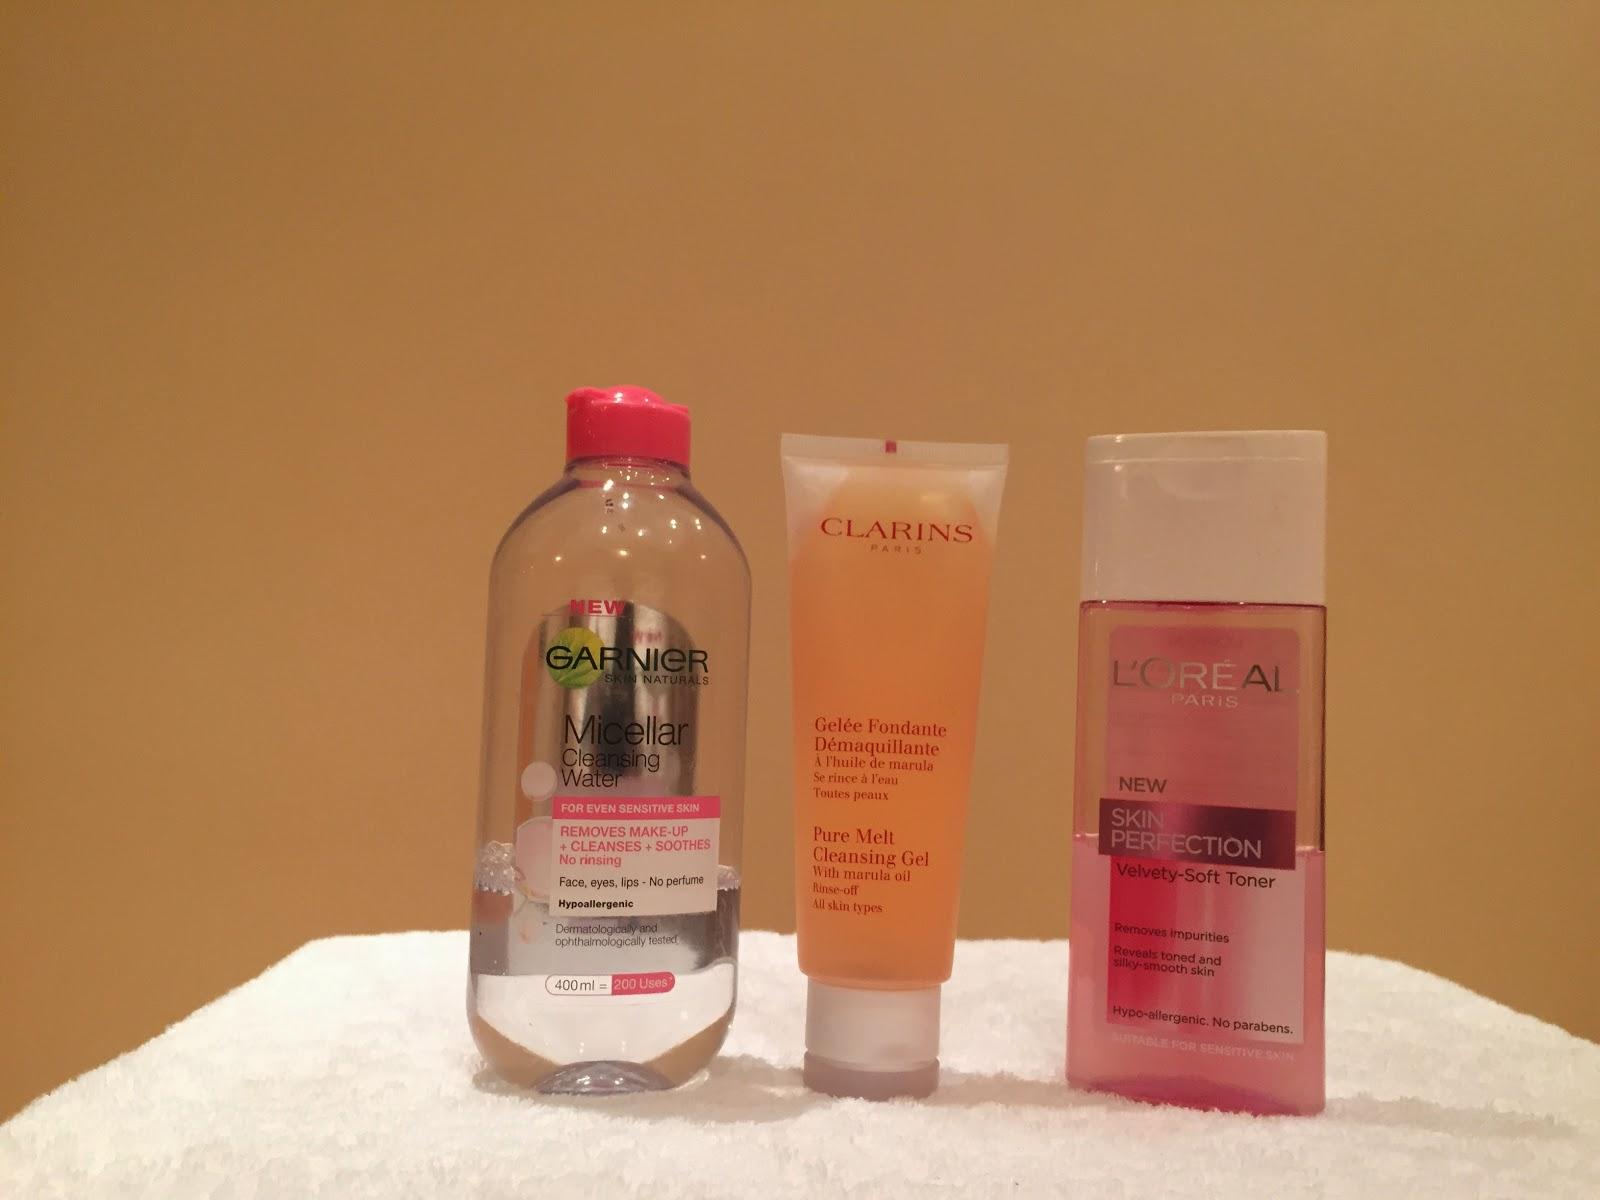 garnier clarins loreal cleanser toner micellar water